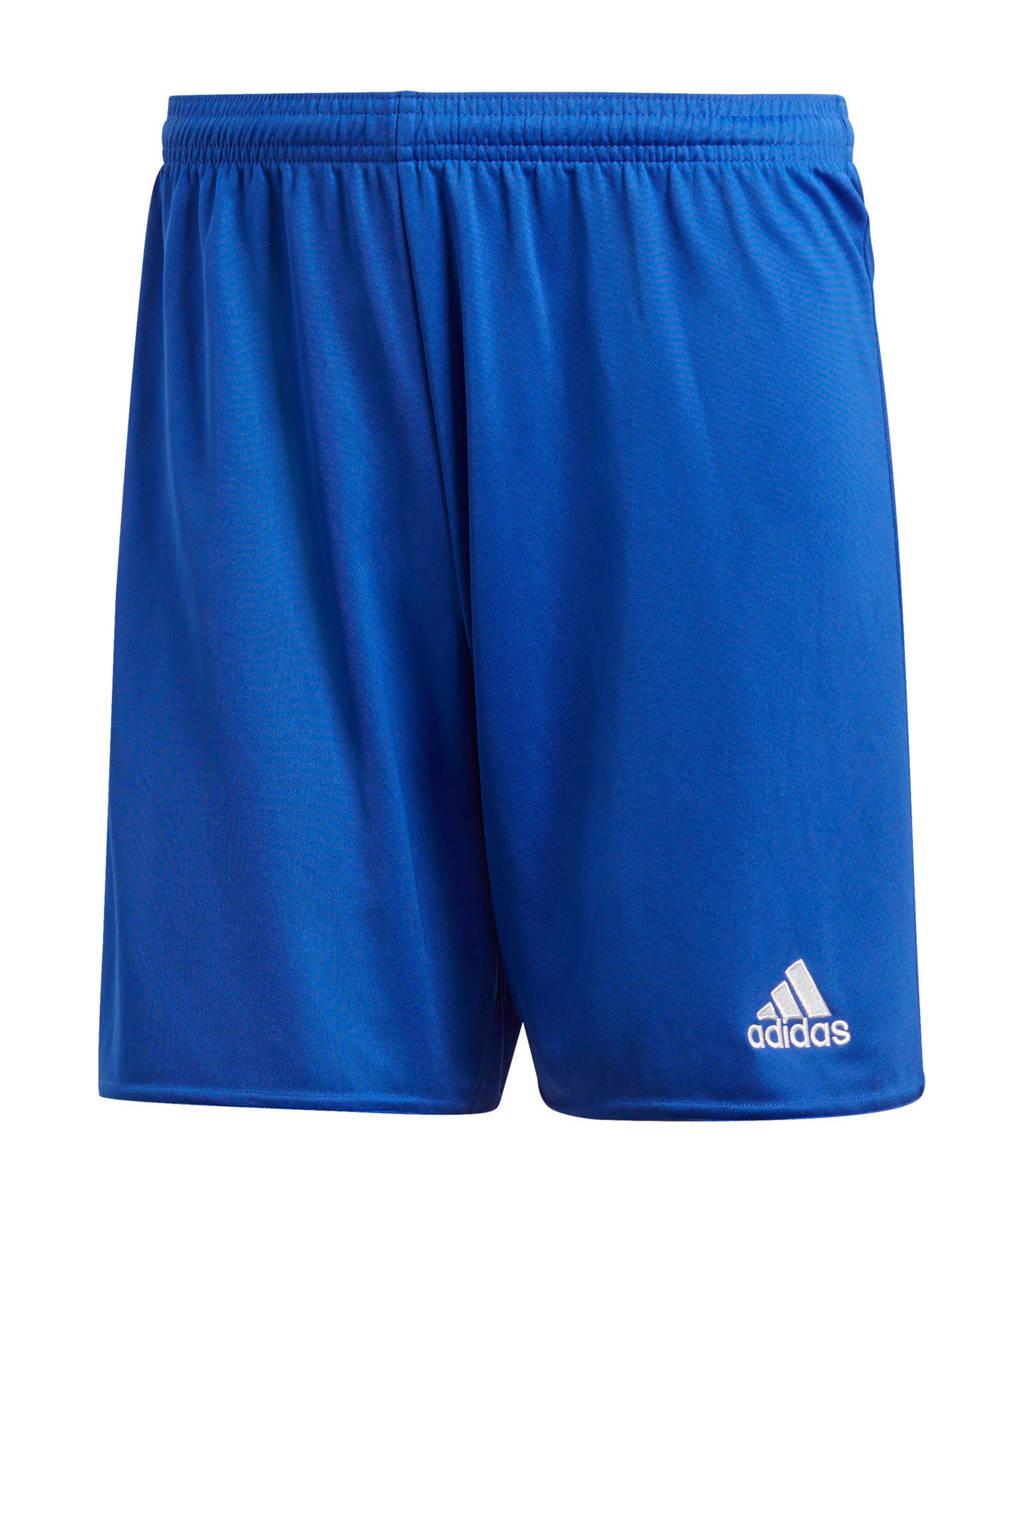 adidas Performance   sportshort Parma blauw, Blauw